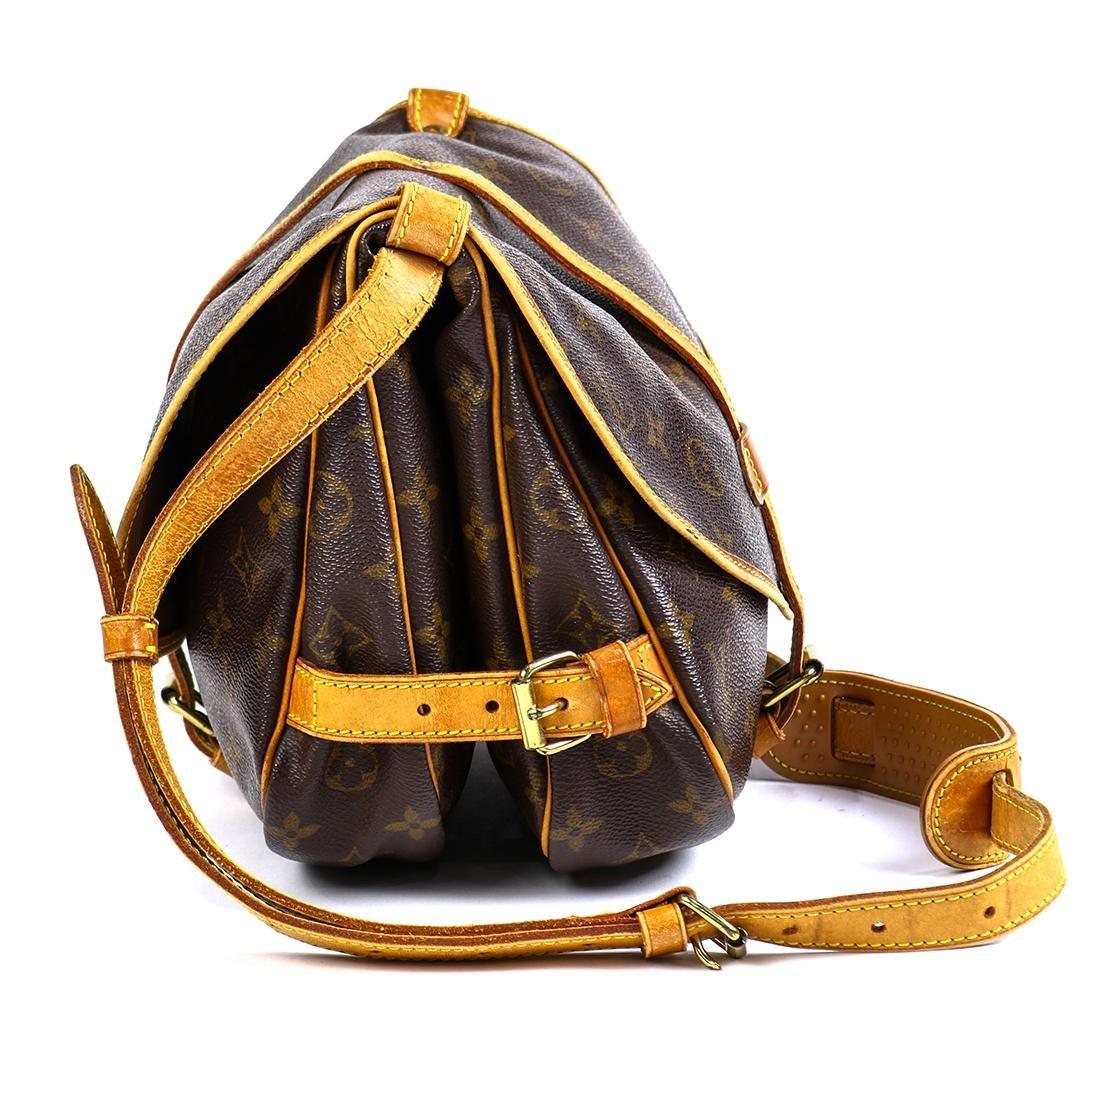 Louis Vuitton Monogram Saumur 25 handbag - 3